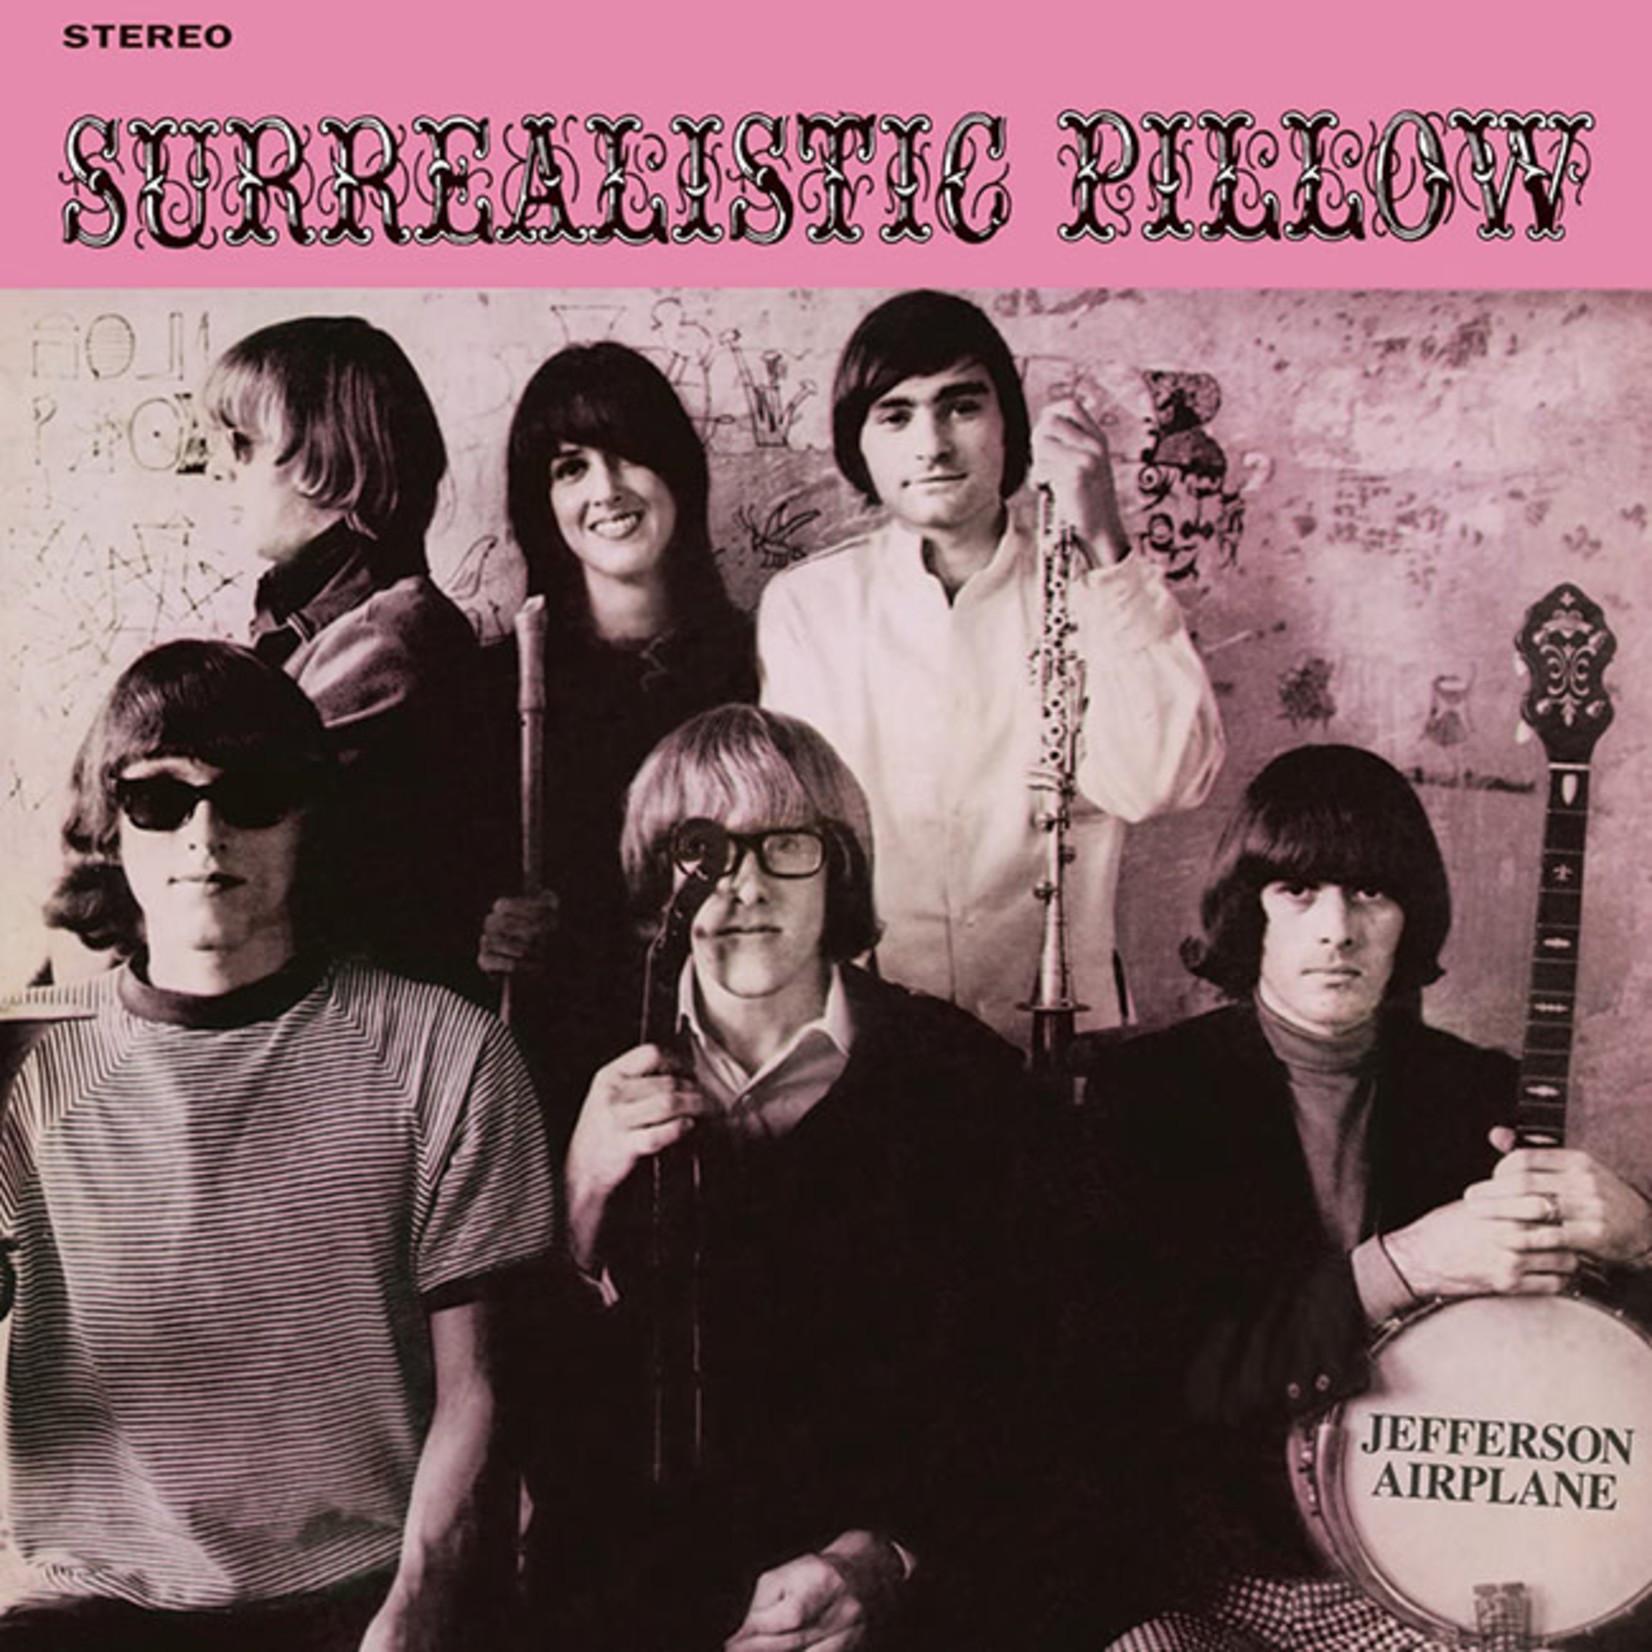 [New] Jefferson Airplane: Surrealistic Pillow